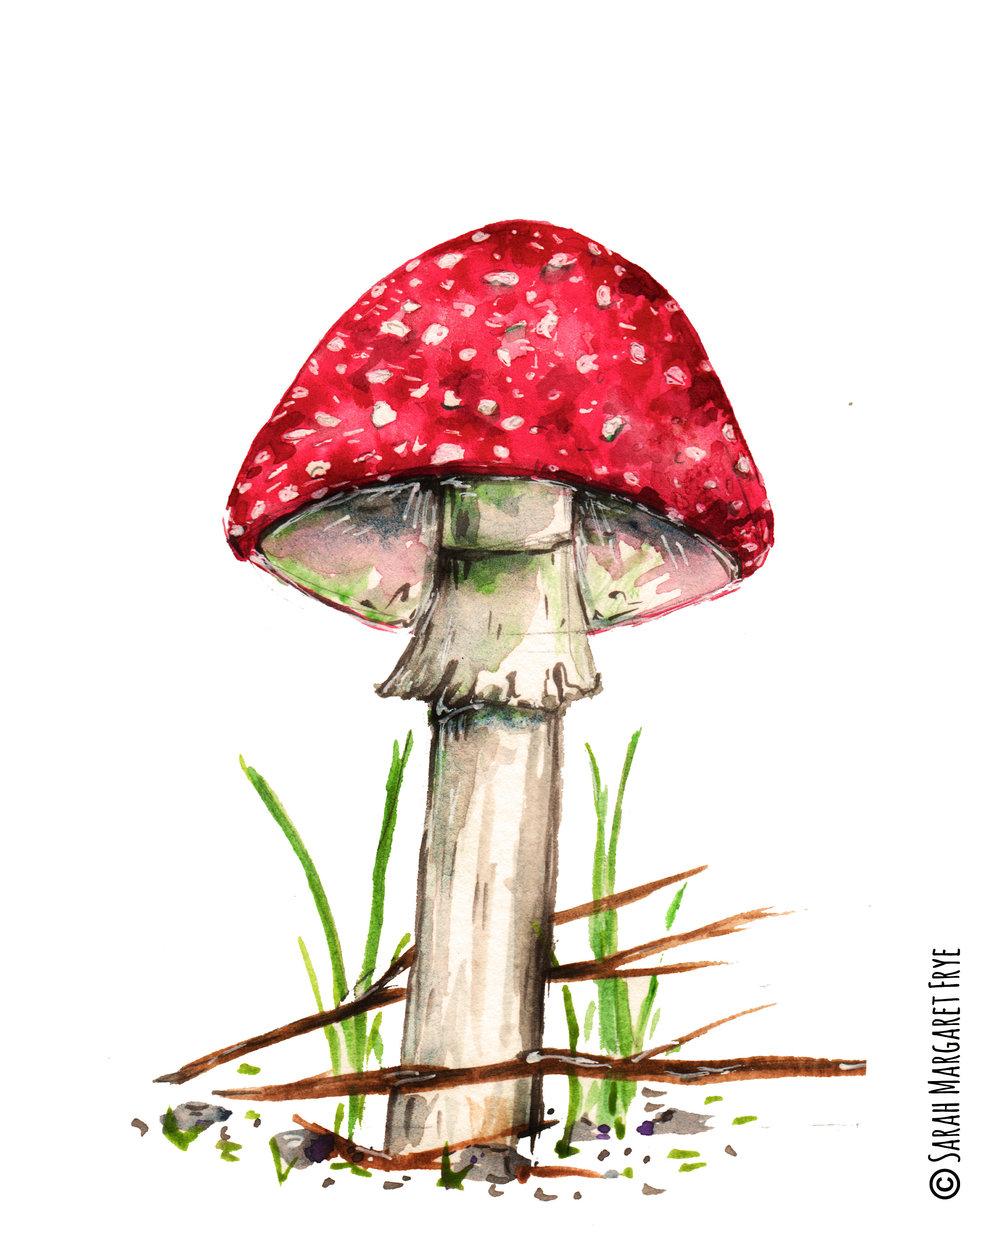 deathcap Mushroom postcard aug 2017 copywrite.jpg